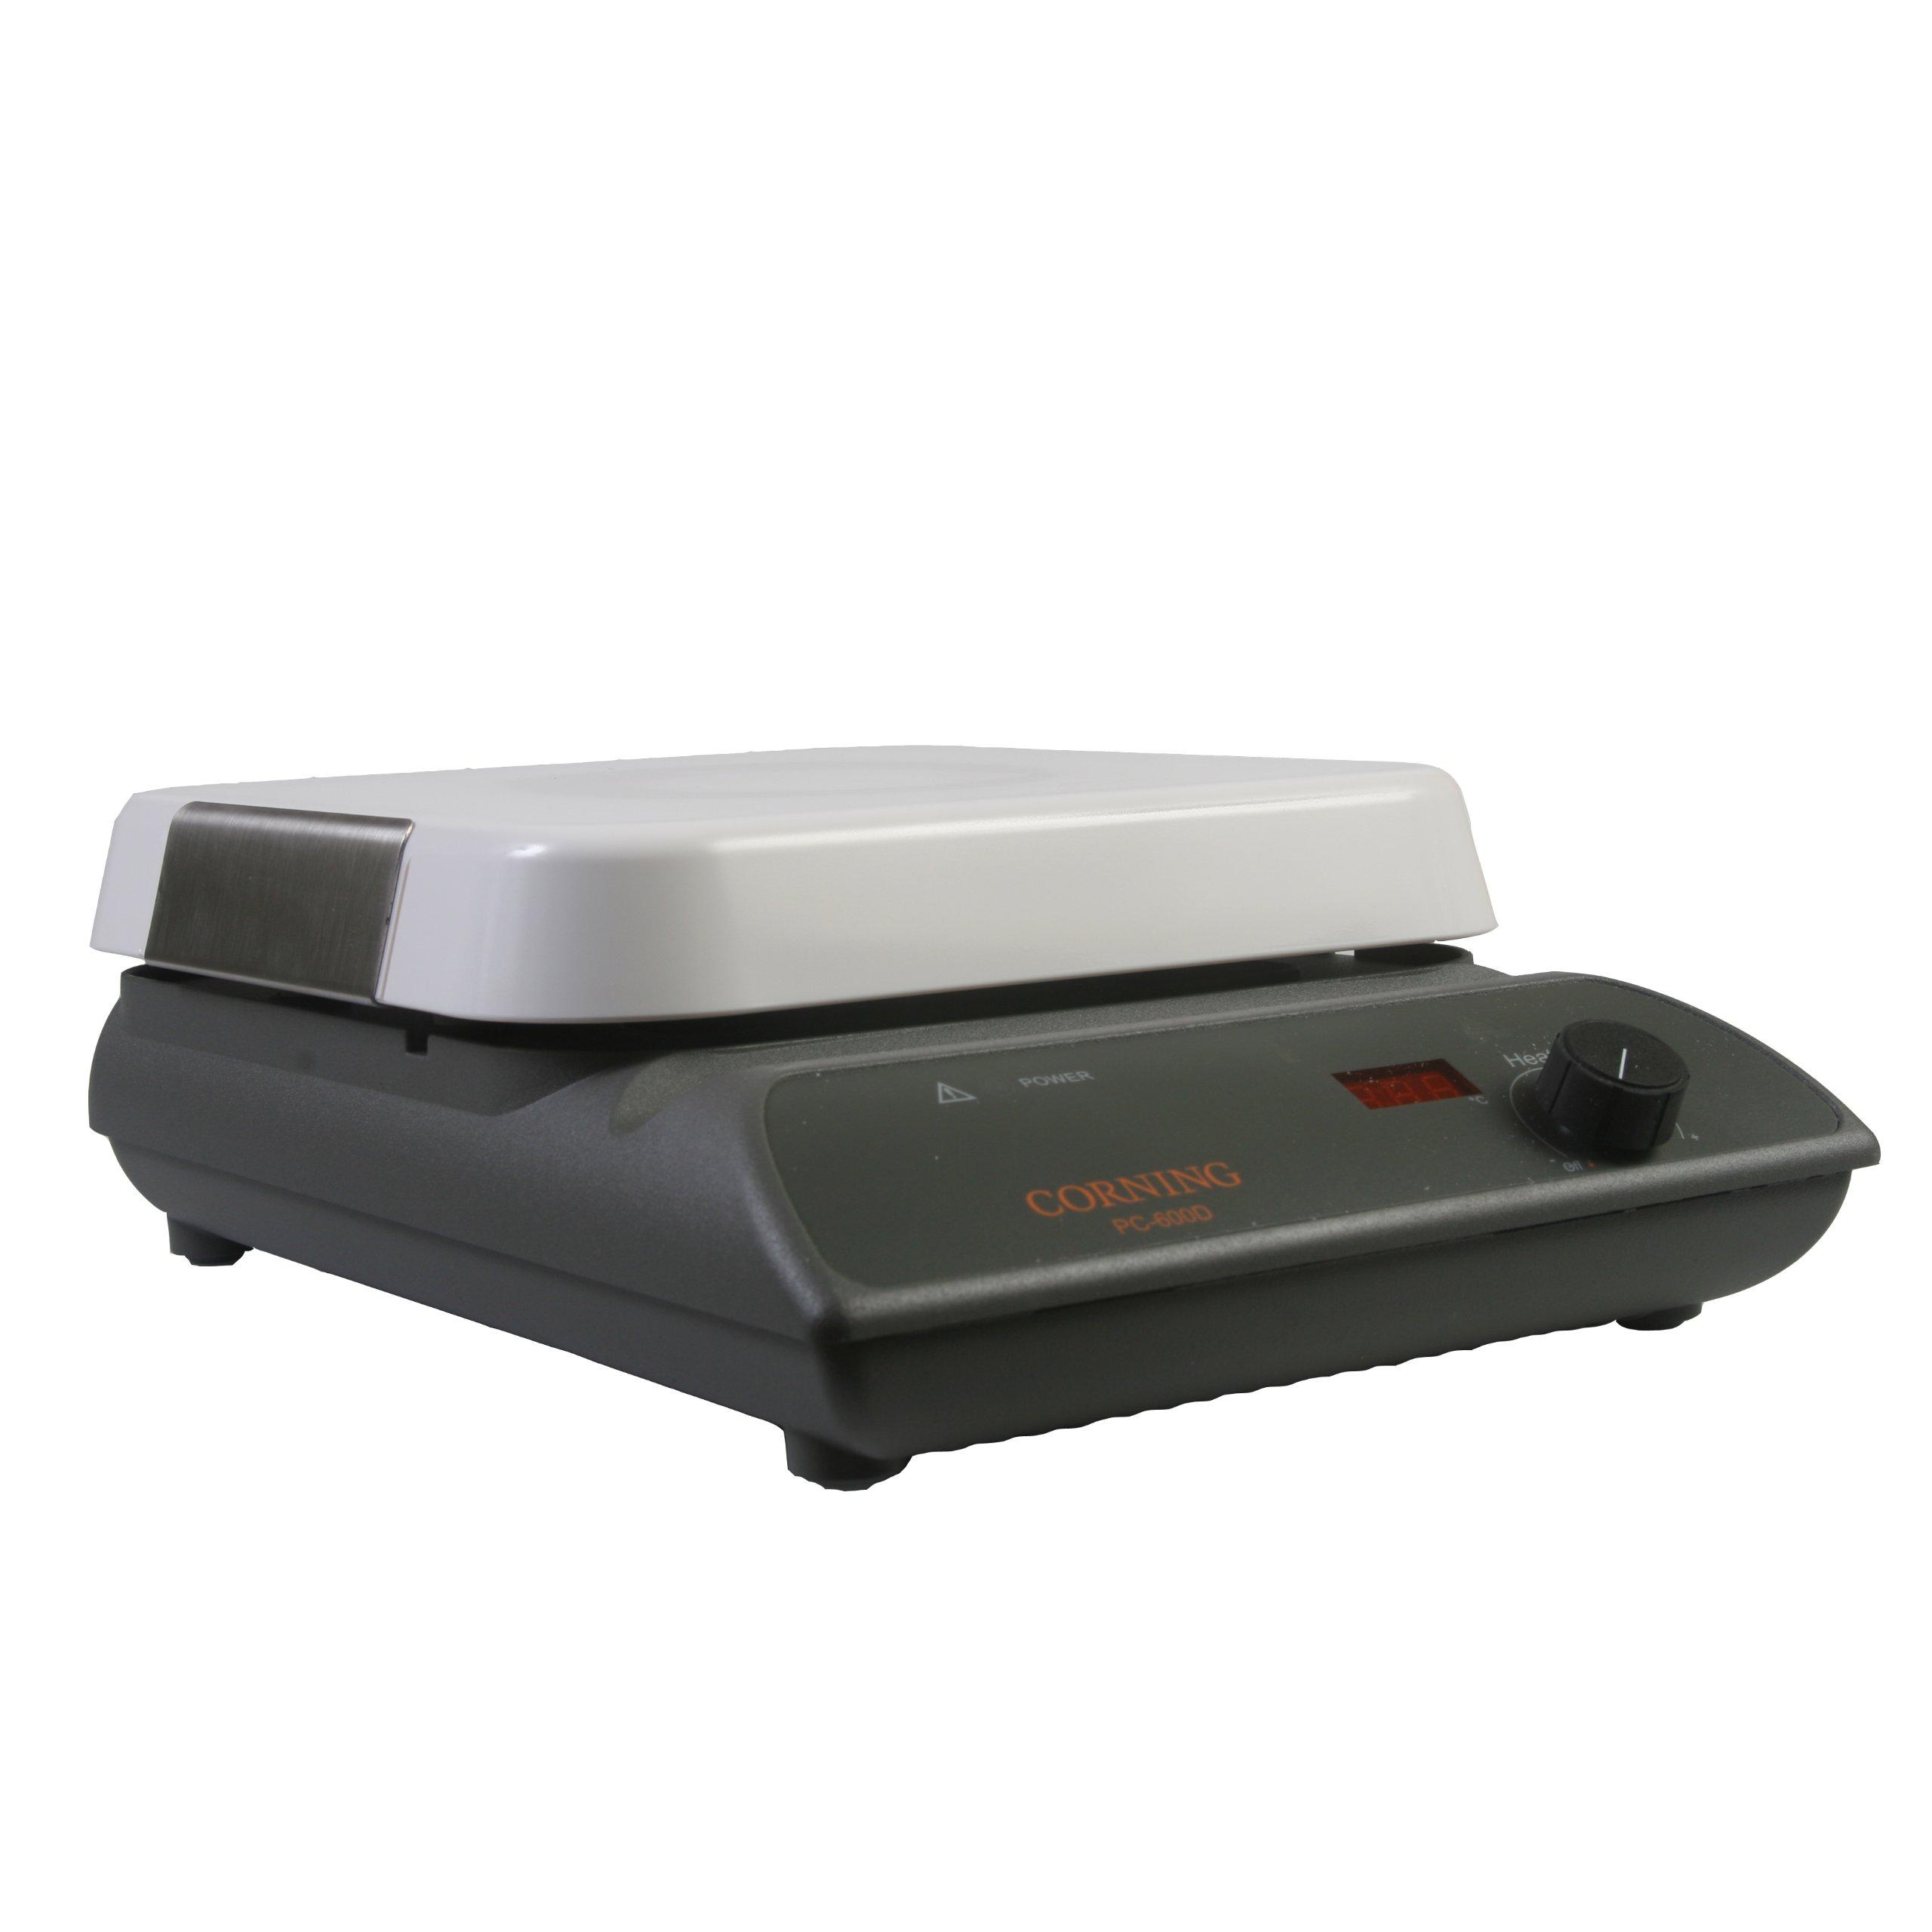 Corning 6795-600D PC-600D Hot Plate, Digital Display, 10'' x 10'' Pyroceram Top, 40.1 x 26.9 x 26.9cm (L x W x H), 5 to 550 Degrees C, 120V/60Hz by Corning